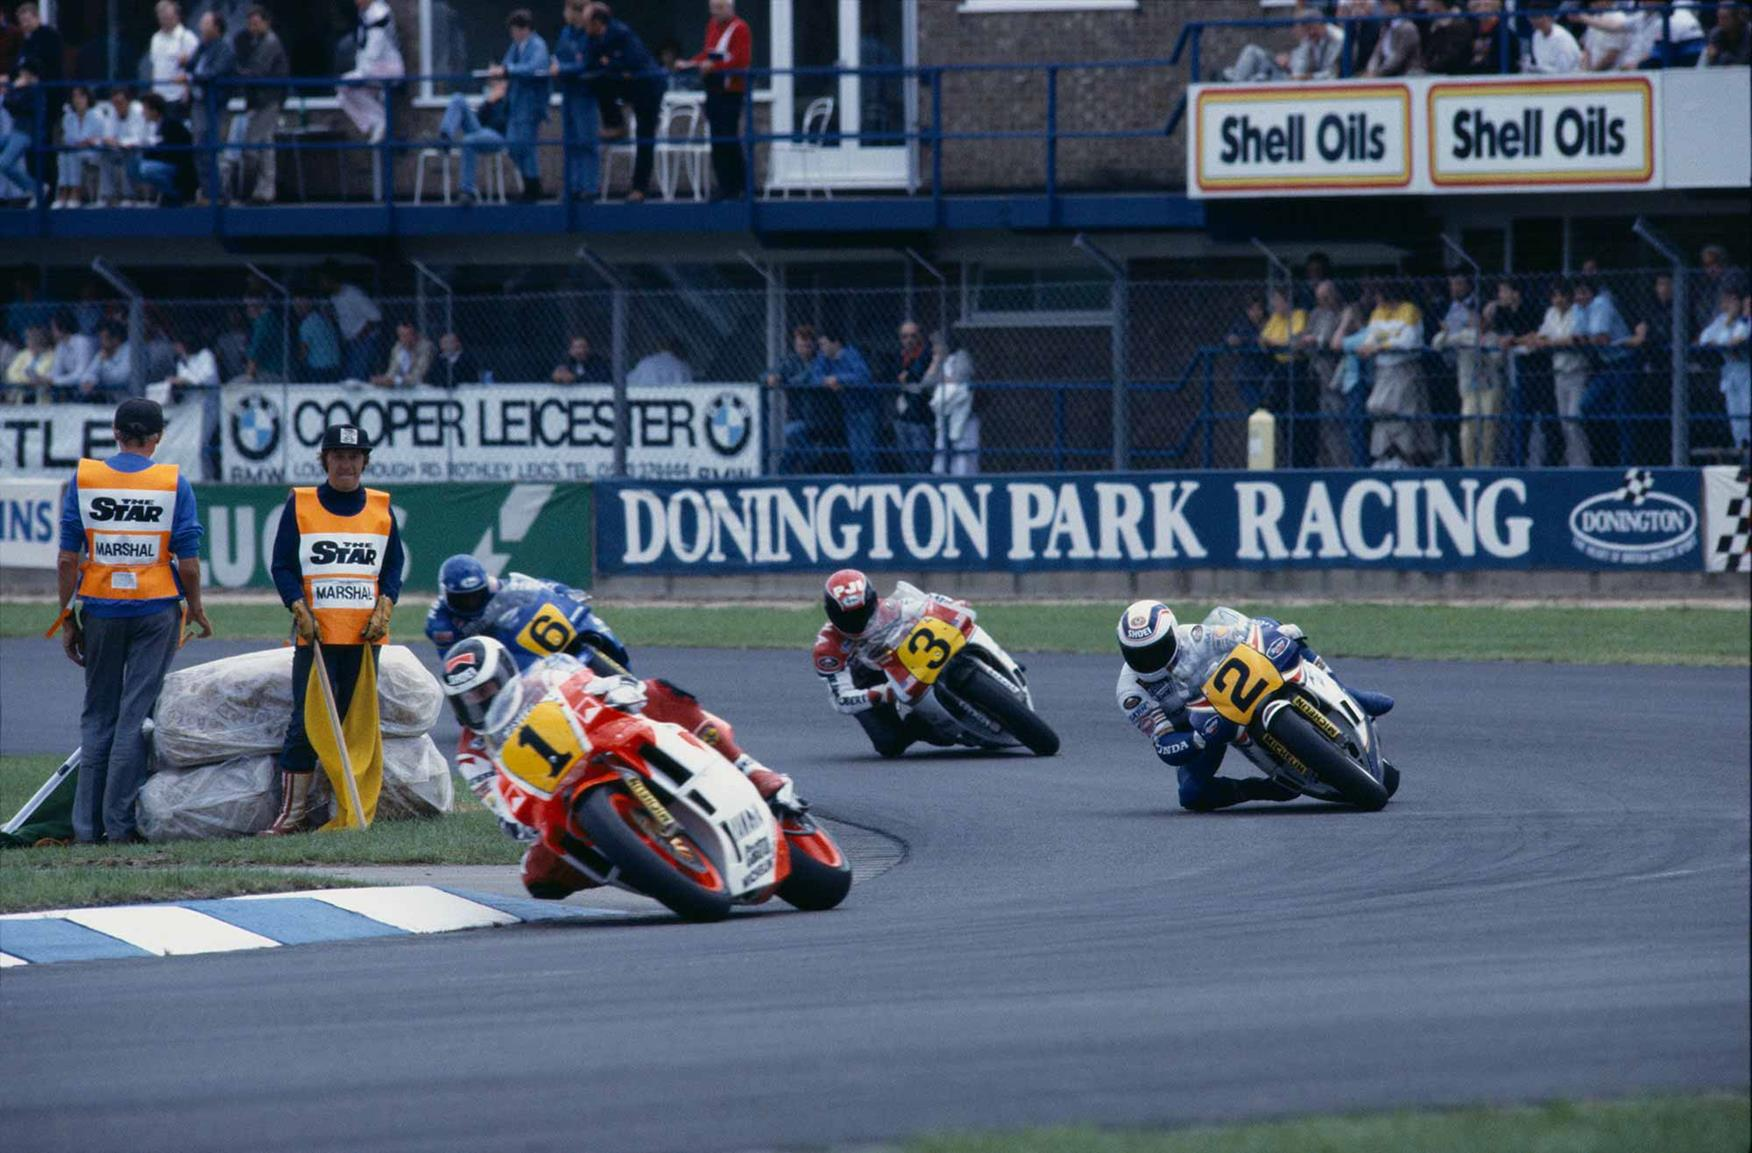 The 1987 British Grand Prix